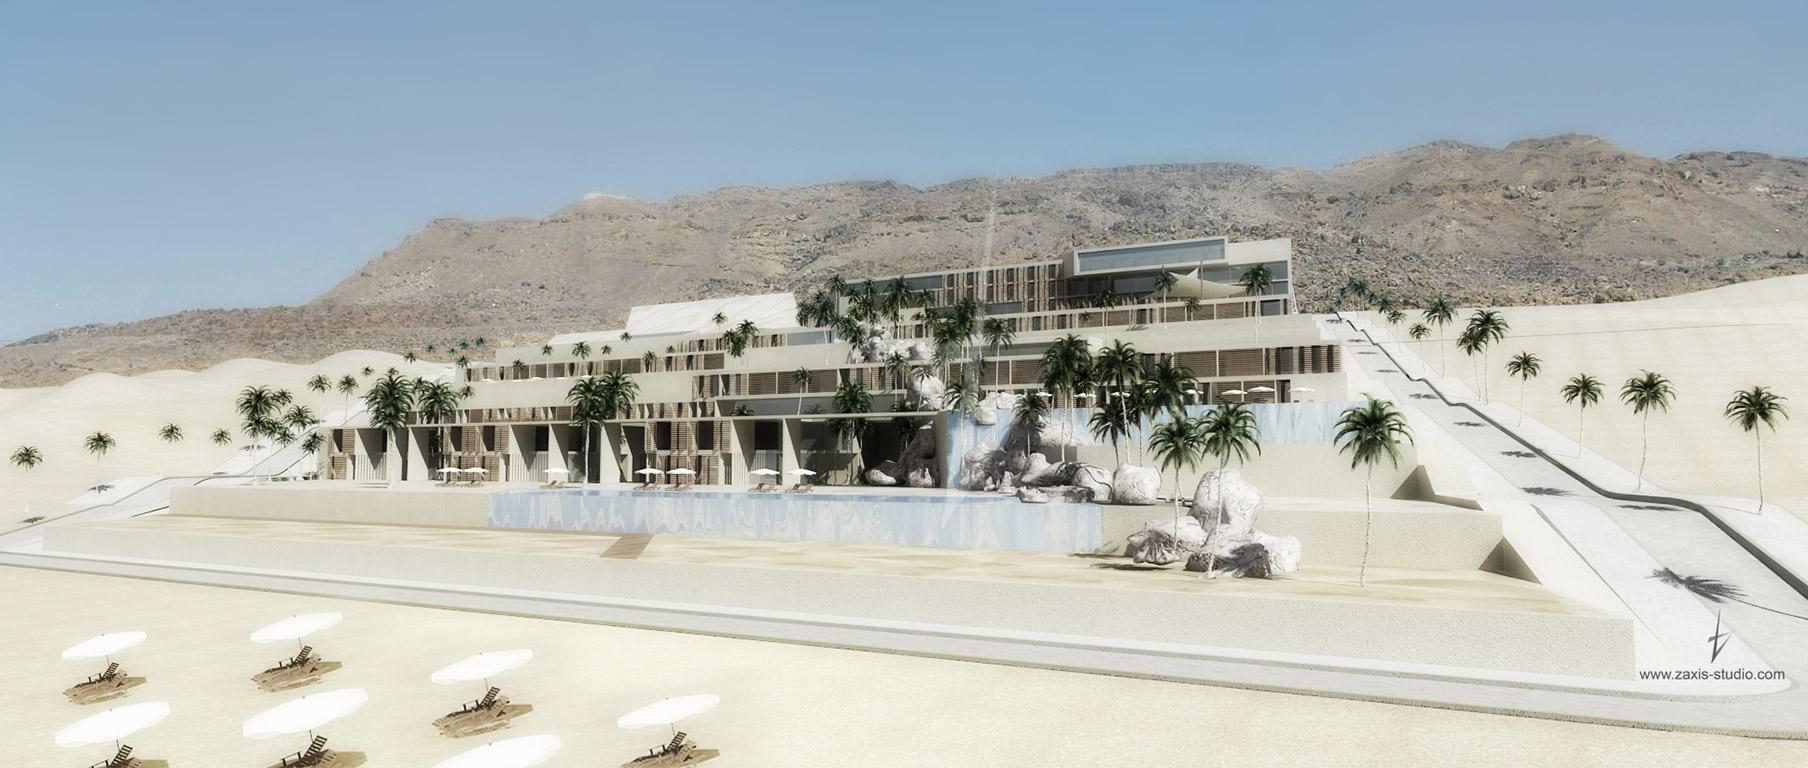 Dead Sea Hotel & Resort by Accent DG